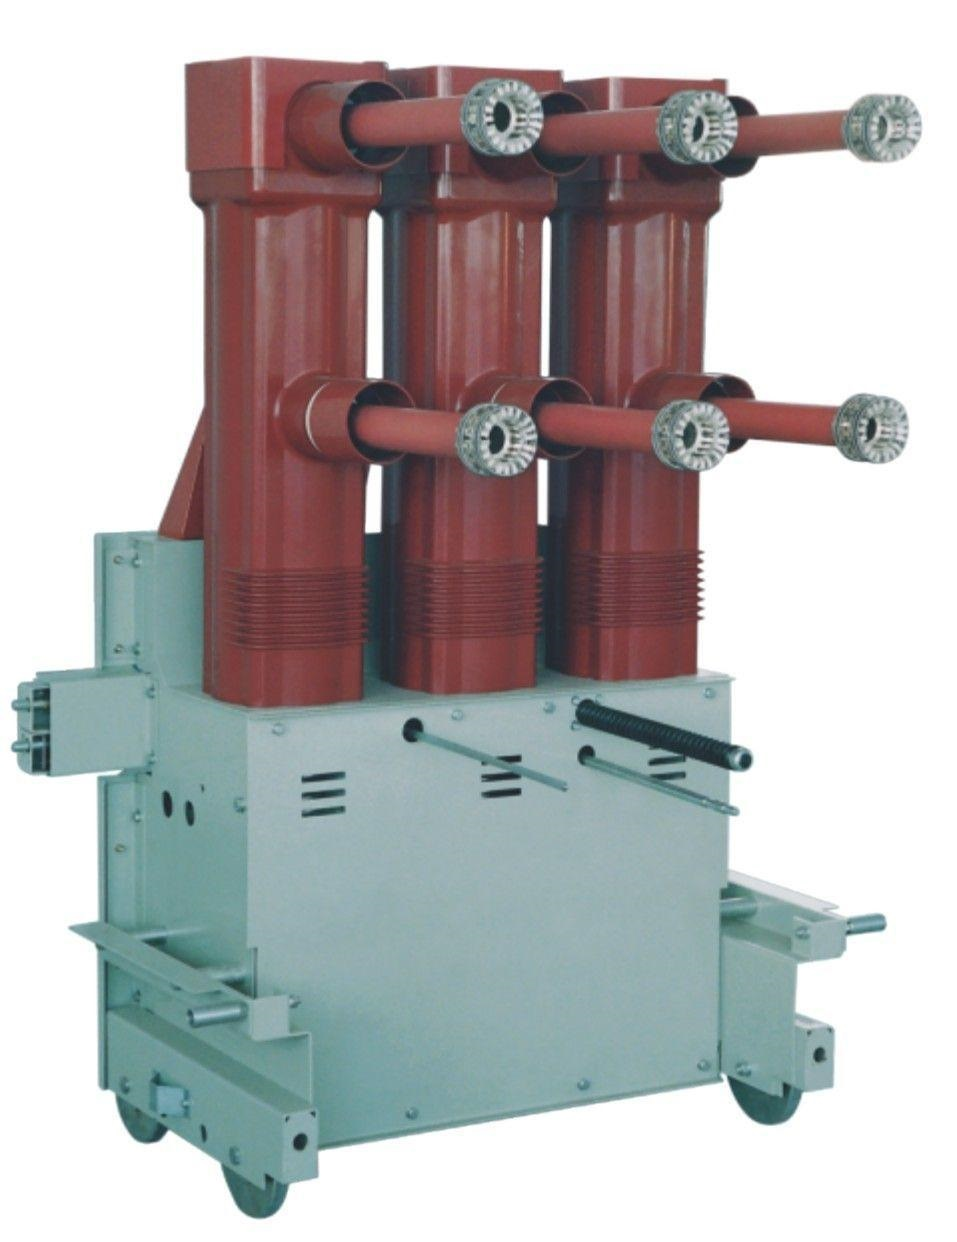 40.5KV VCB Vacuum Circuit Breaker indoor type from JUCRO Electric